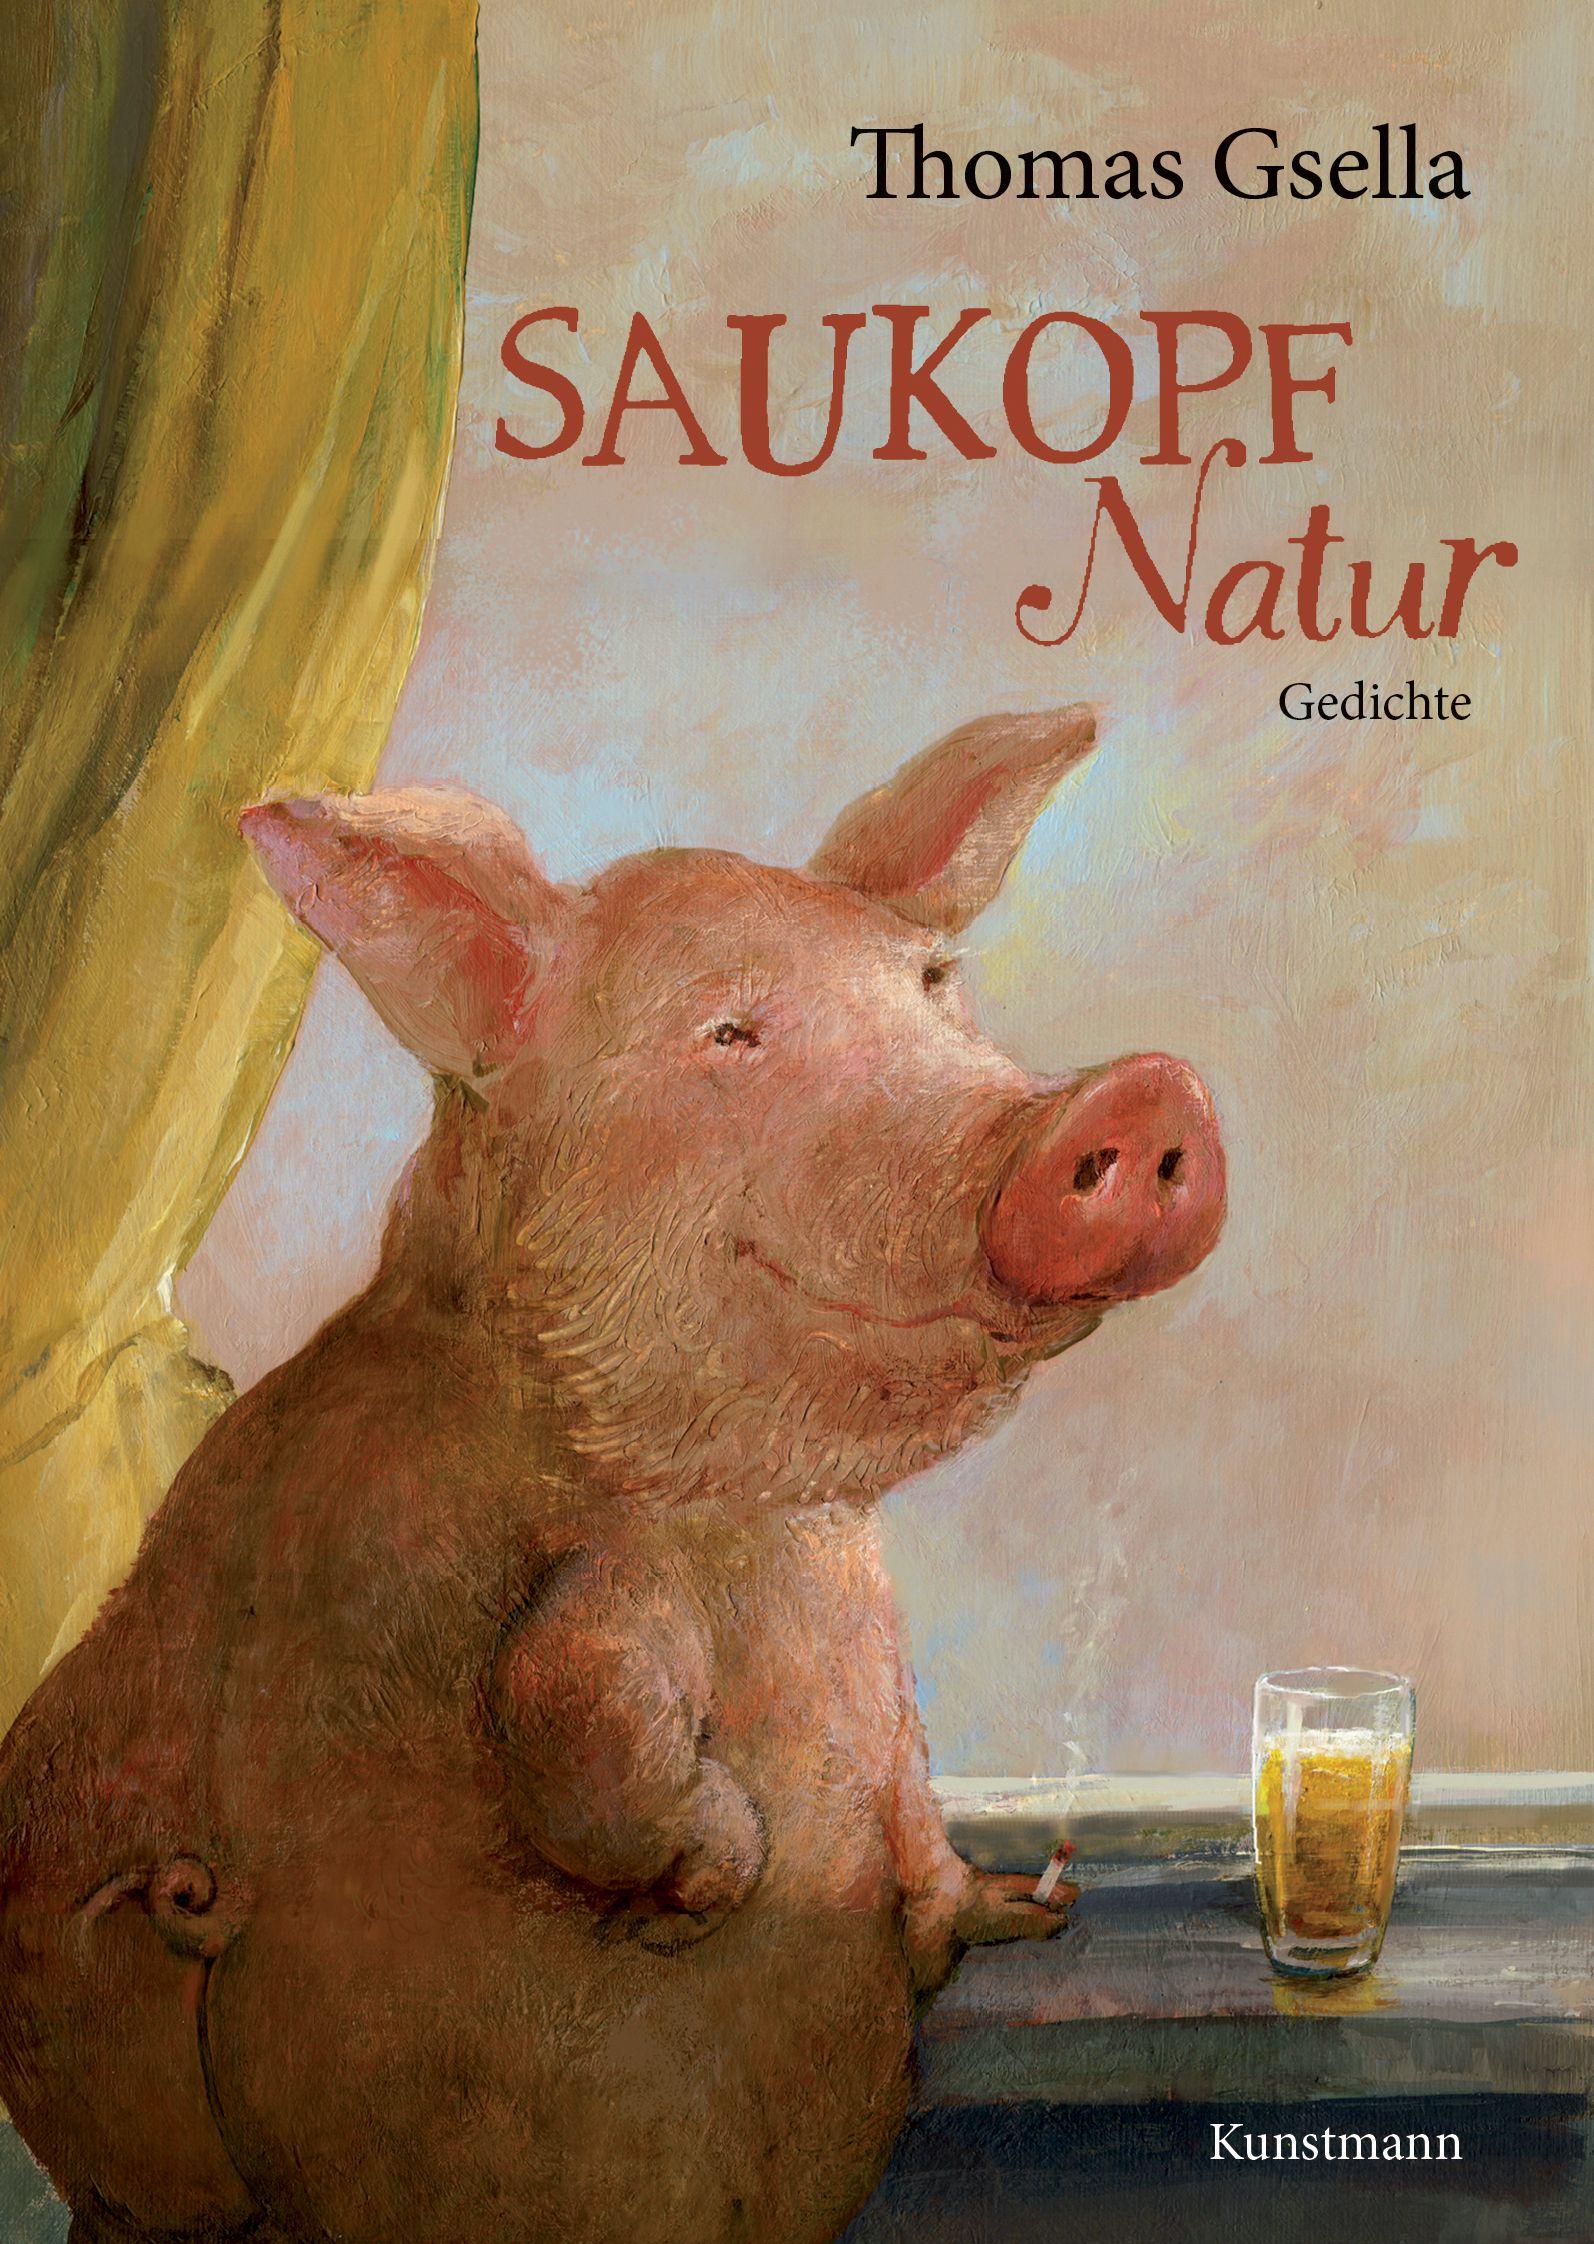 Buecher-Rudi-Hurzlmeier - saukopf-natur_9783956141256.jpg